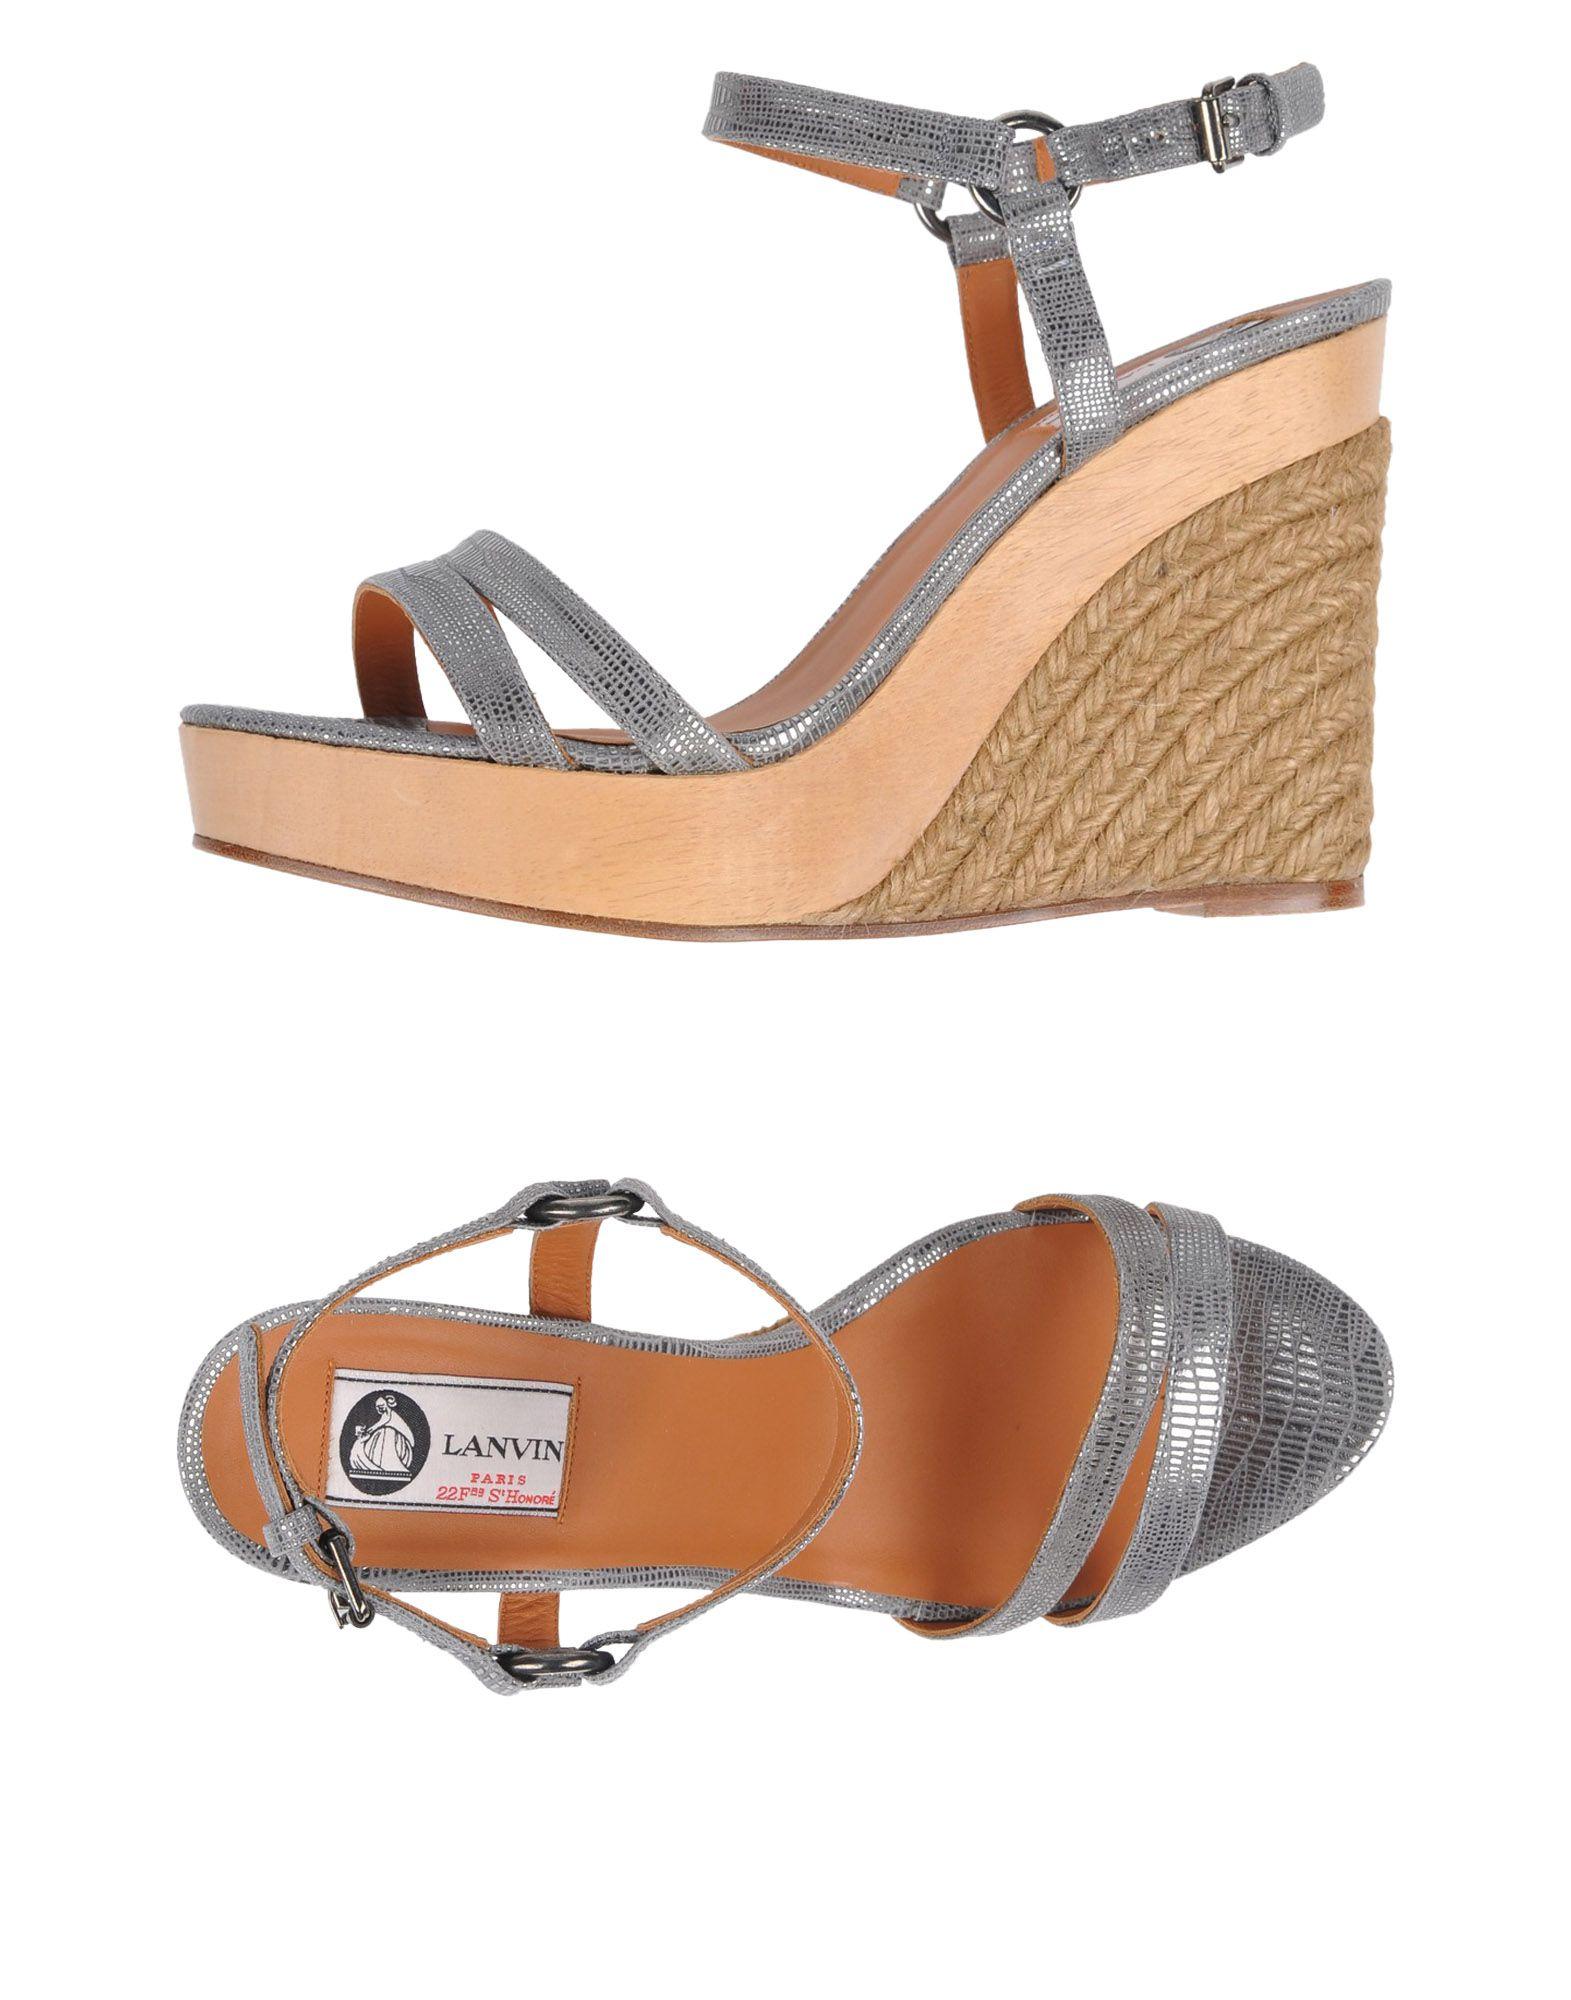 Lanvin Sandals - on Women Lanvin Sandals online on -  Canada - 11479585UC ed4fa7